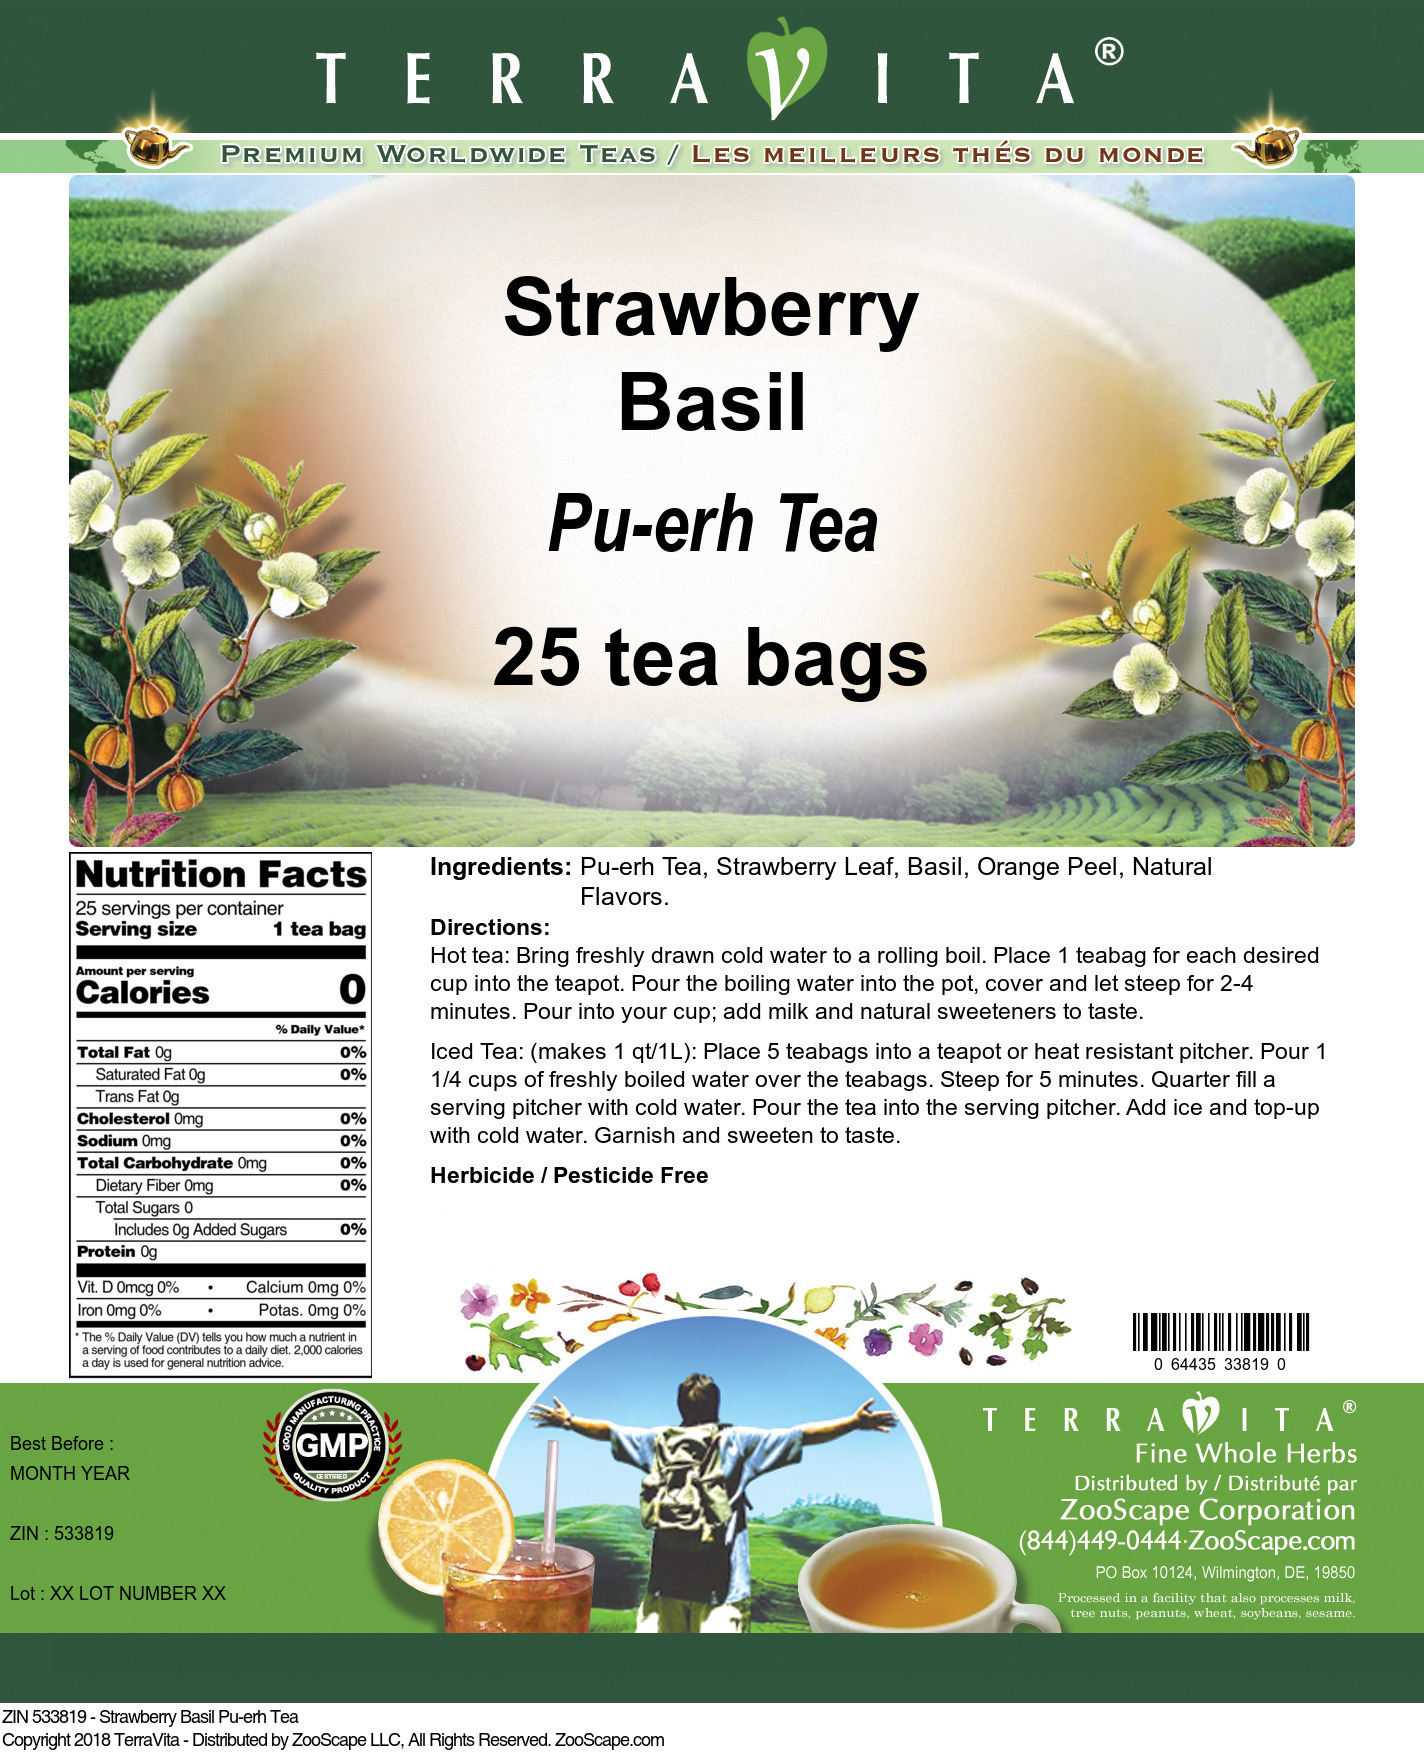 Strawberry Basil Pu-erh Tea